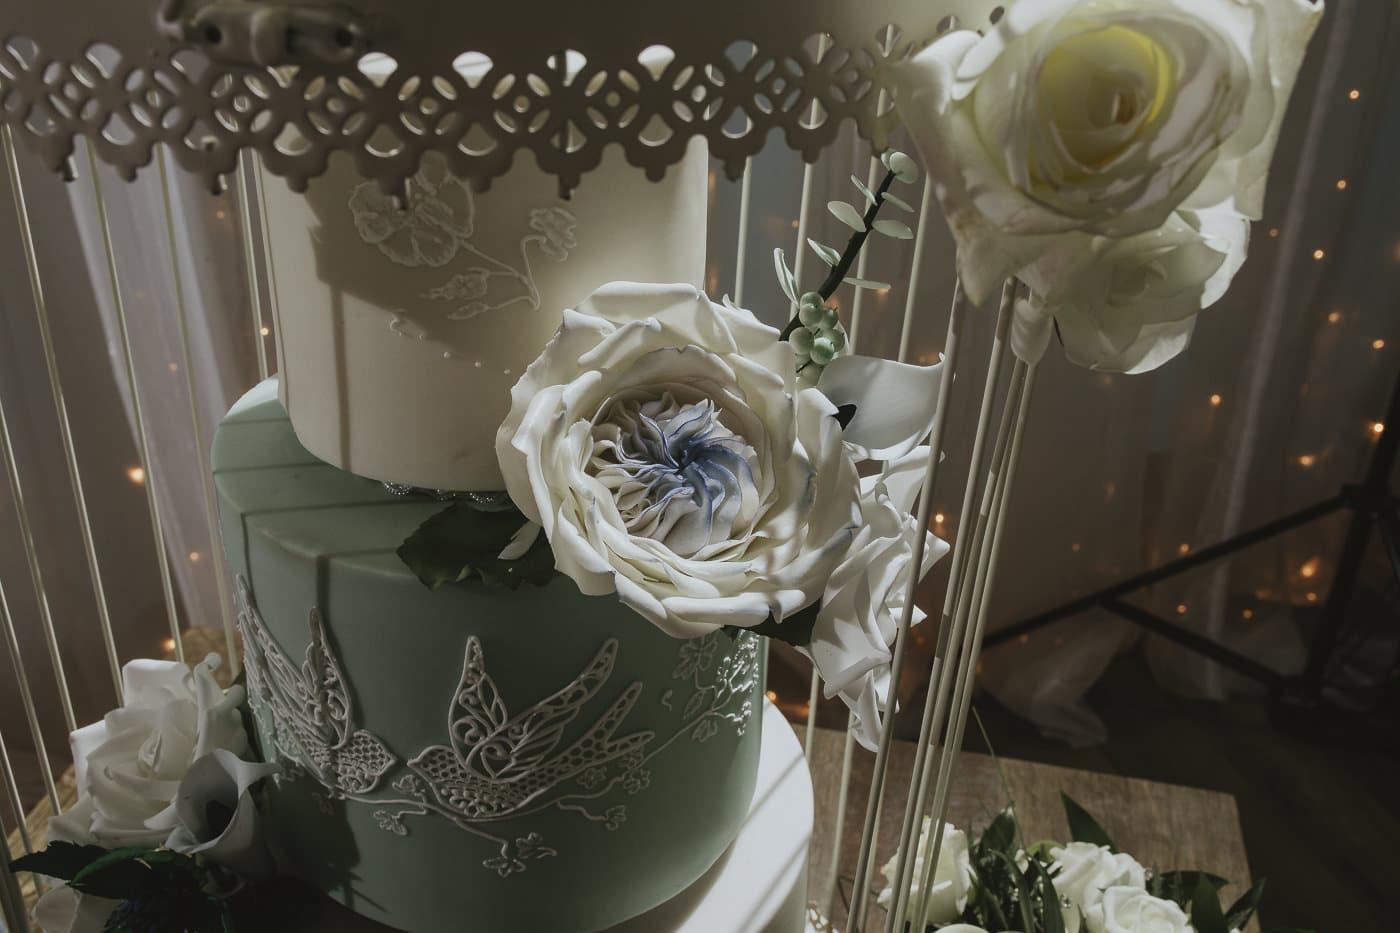 Mama Cake Cumbria cake maker detail photograph of sugar petals